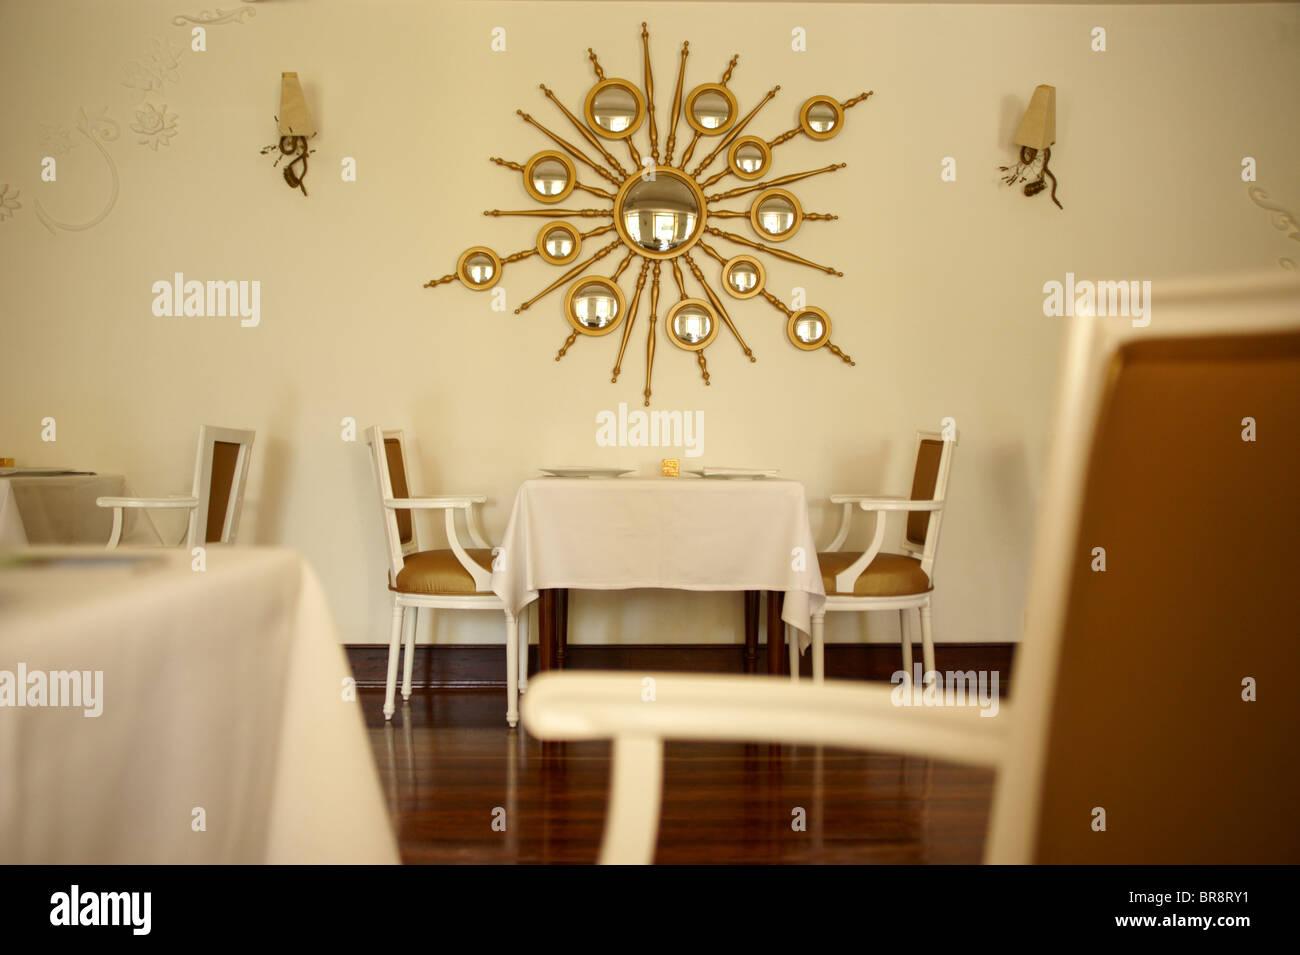 Posh Restaurant Interior Stock Photos & Posh Restaurant Interior ...